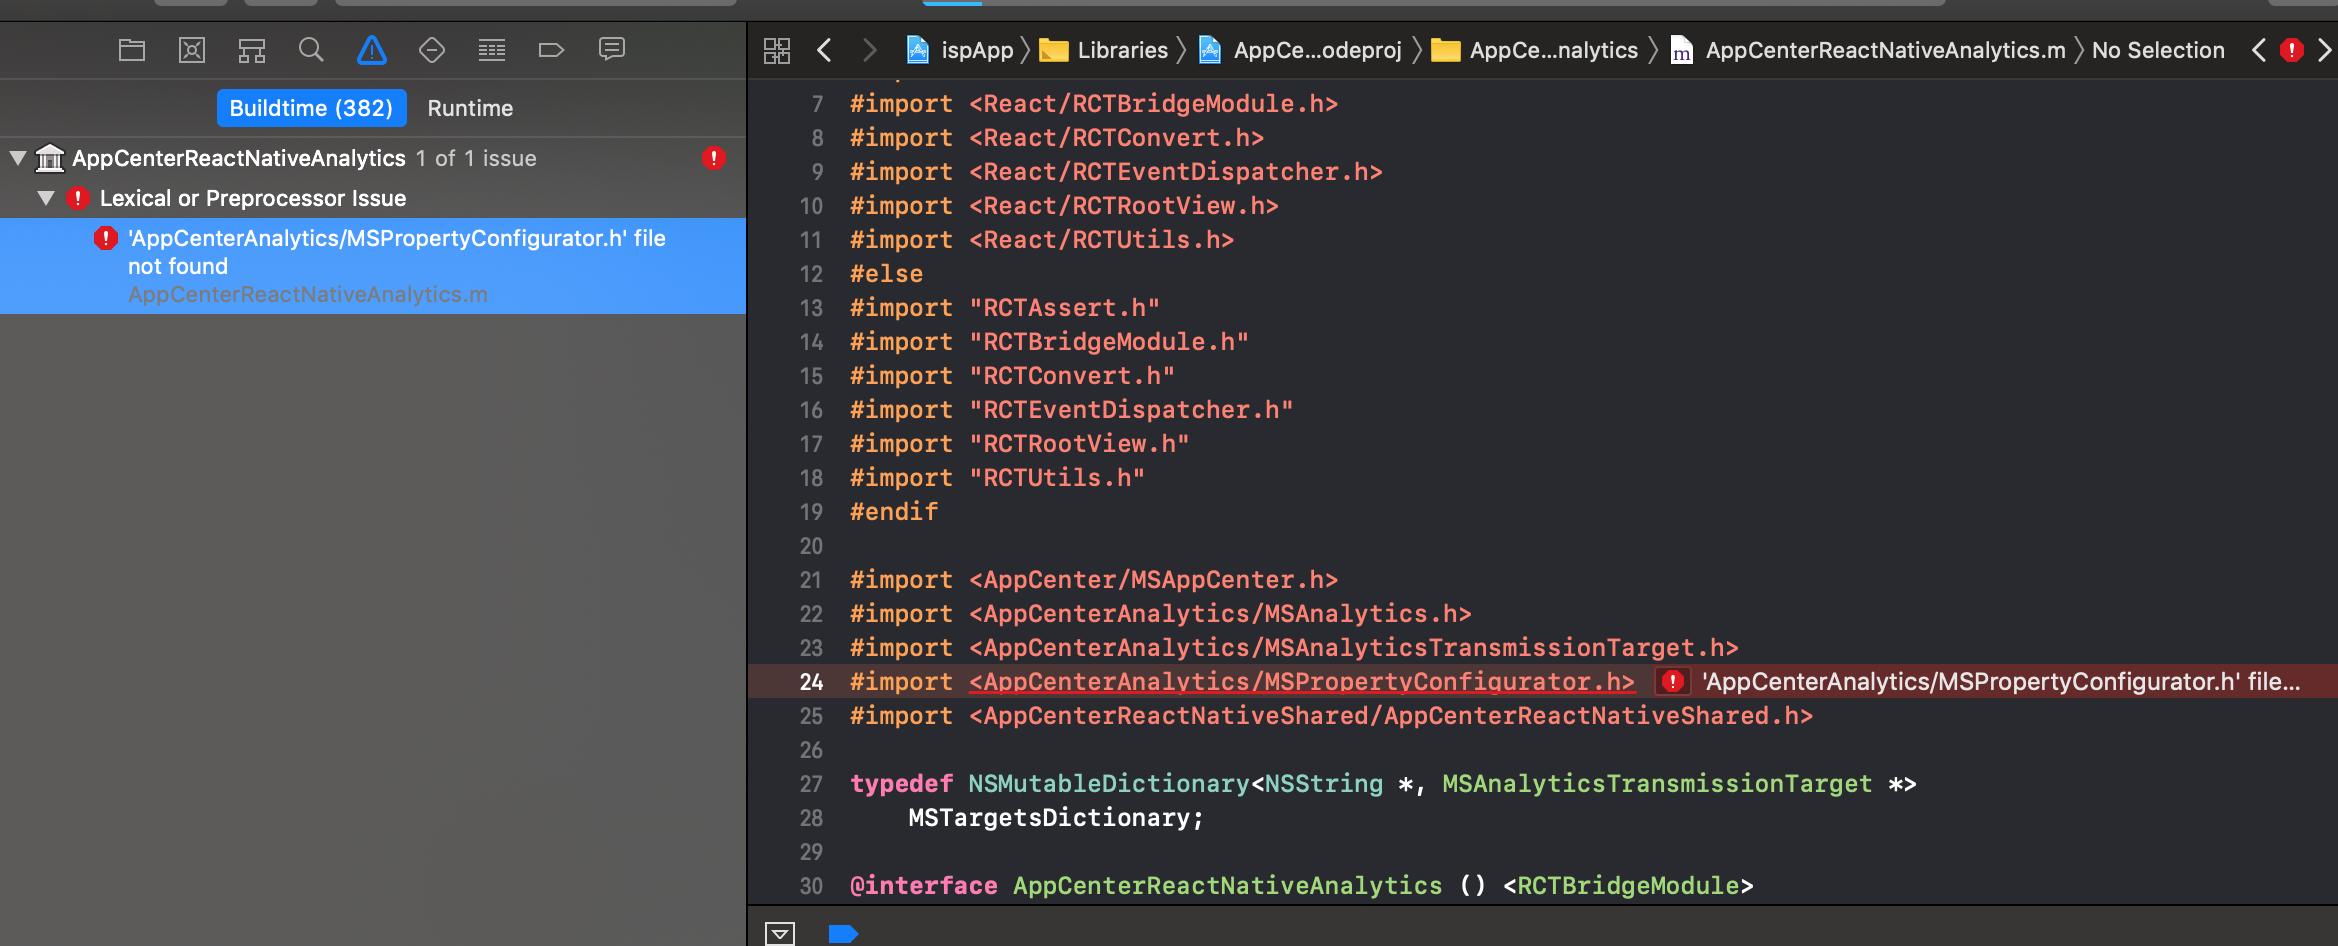 import <AppCenterAnalytics/MSPropertyConfigurator h> file